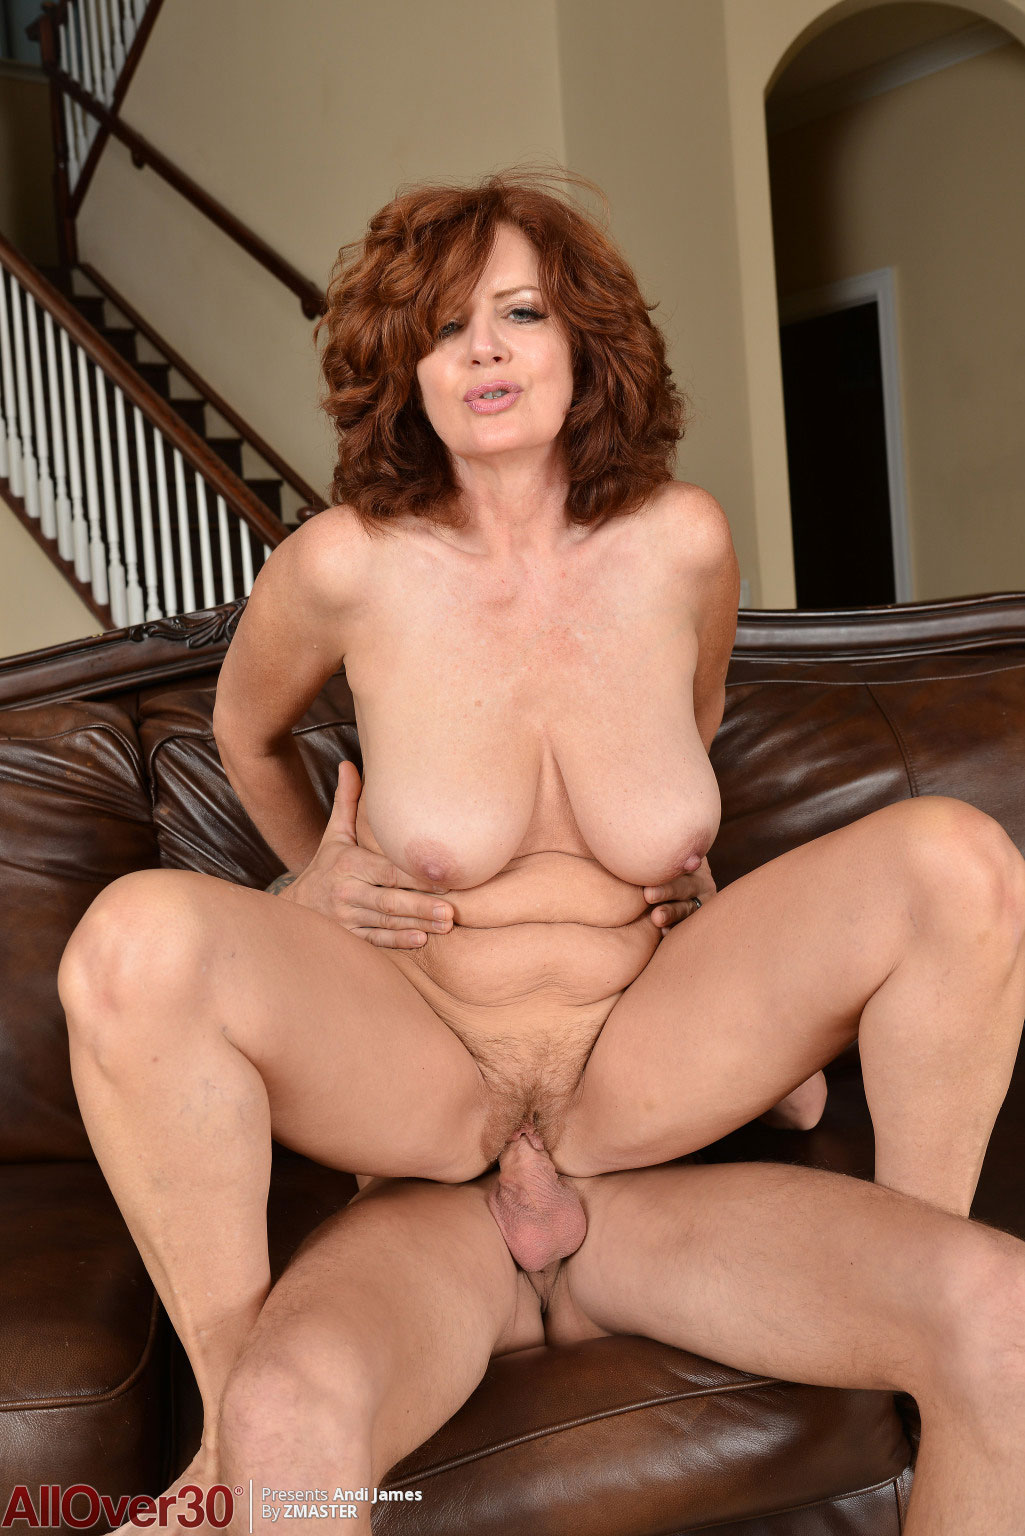 mature-redhead-rides-cock-porn-image-downloader